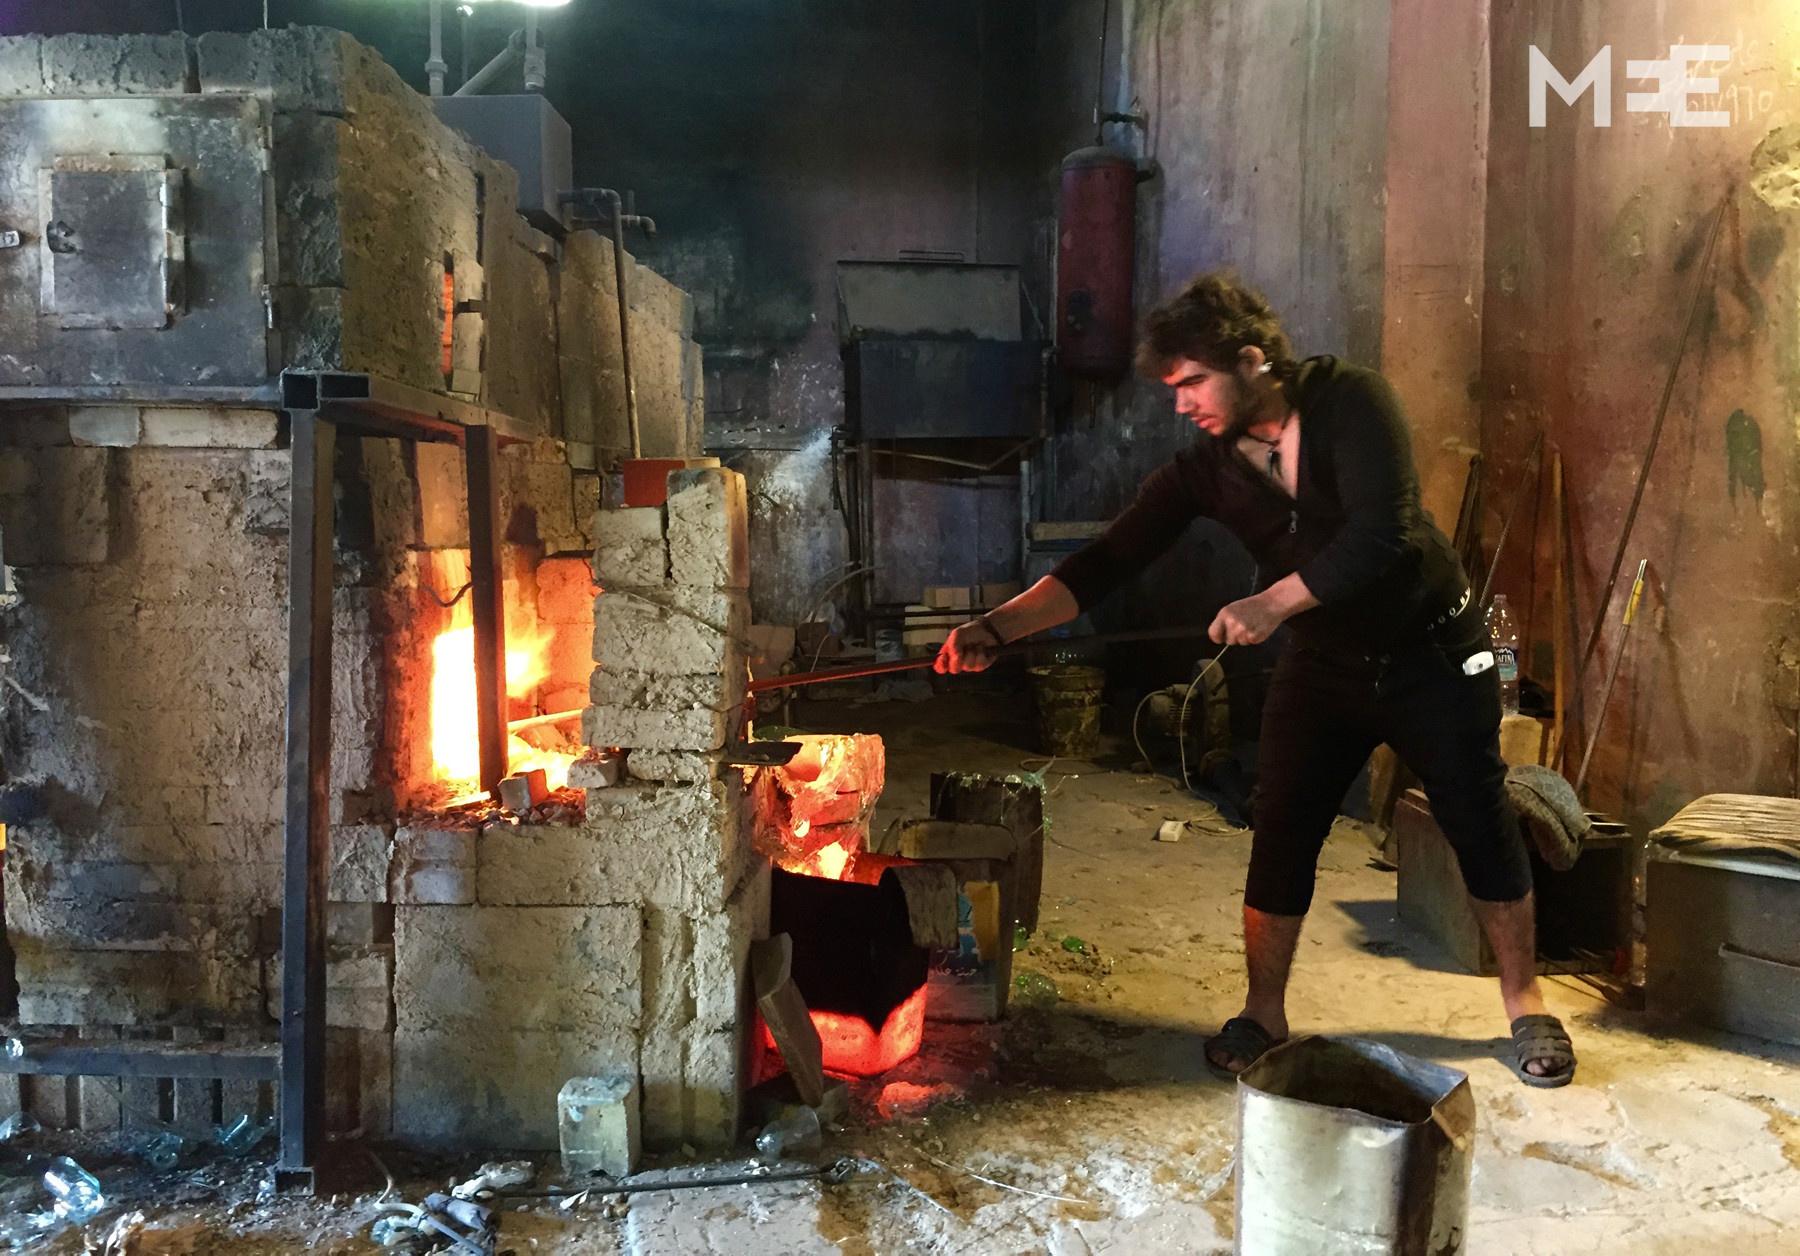 crafts in lebanon essay